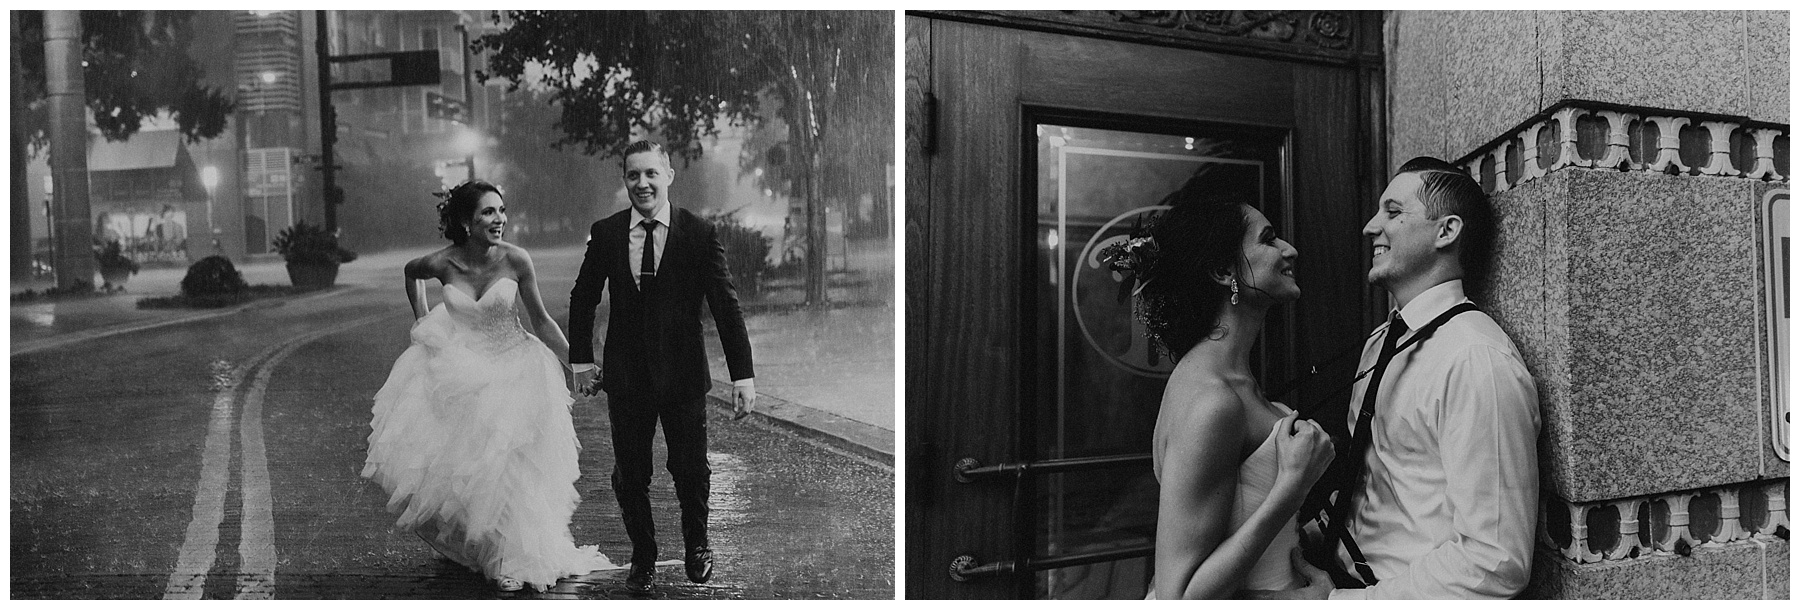 YBOR Wedding Tampa Wedding Photographer-133.jpg